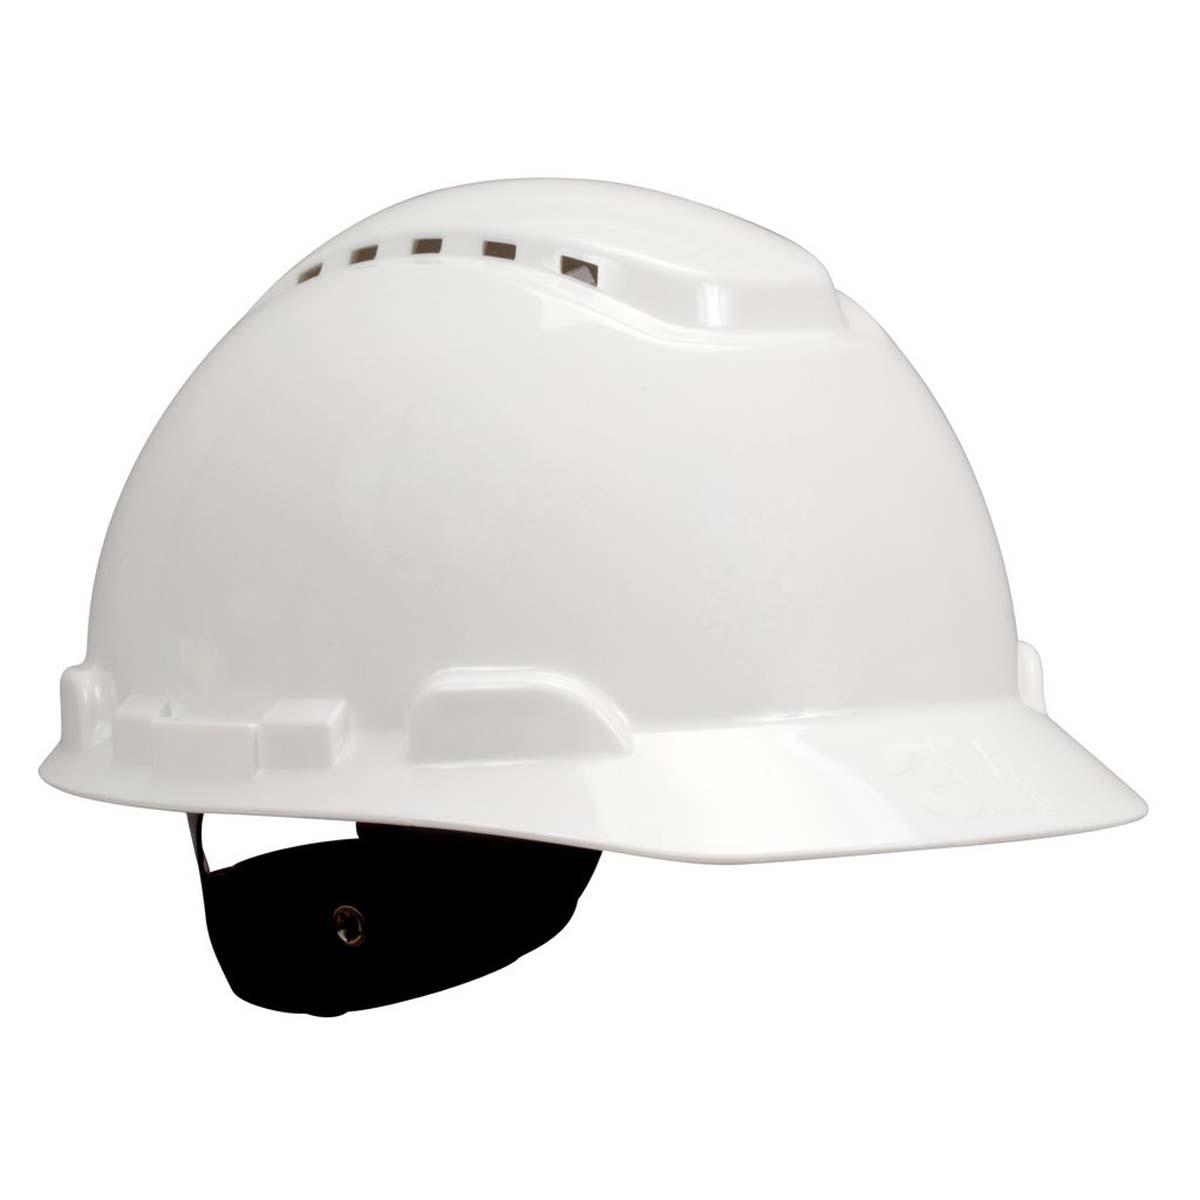 "3Mâ""¢ Hard Hat H-701V, Vented White 4-Point Ratchet Suspension,"